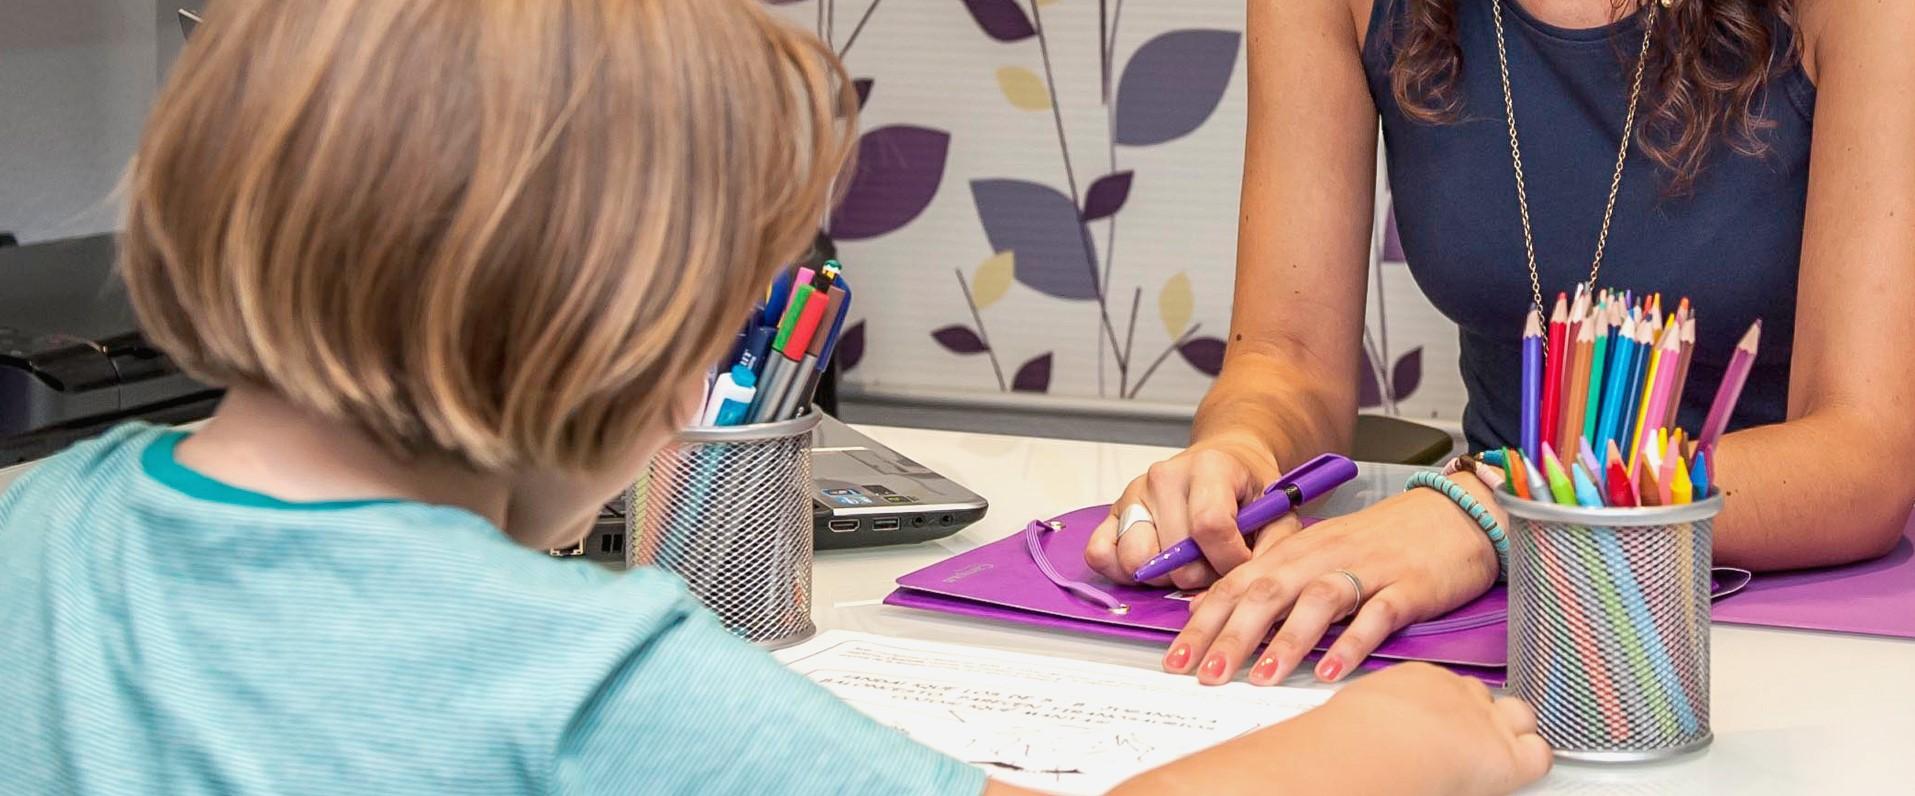 psicóloga infantil en valencia - psicóloga y niño